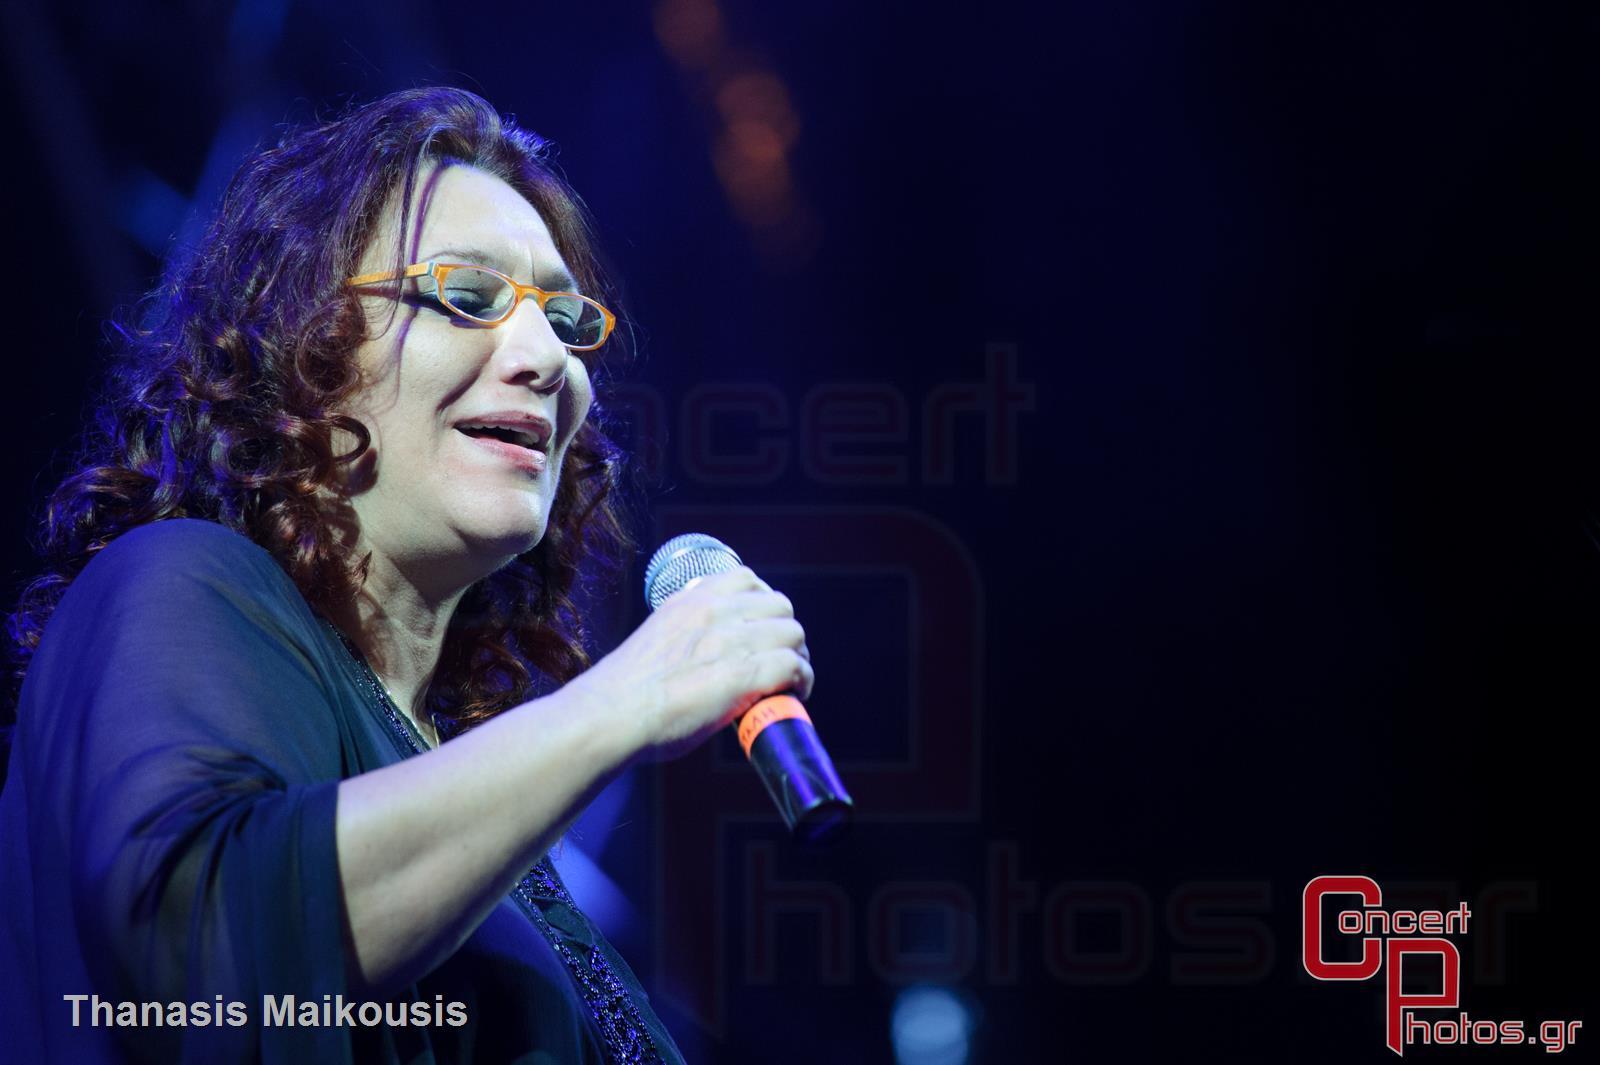 Active Member - Τραγούδα μας να φύγει το σκοτάδι- photographer: Thanasis Maikousis - concertphotos_-5600